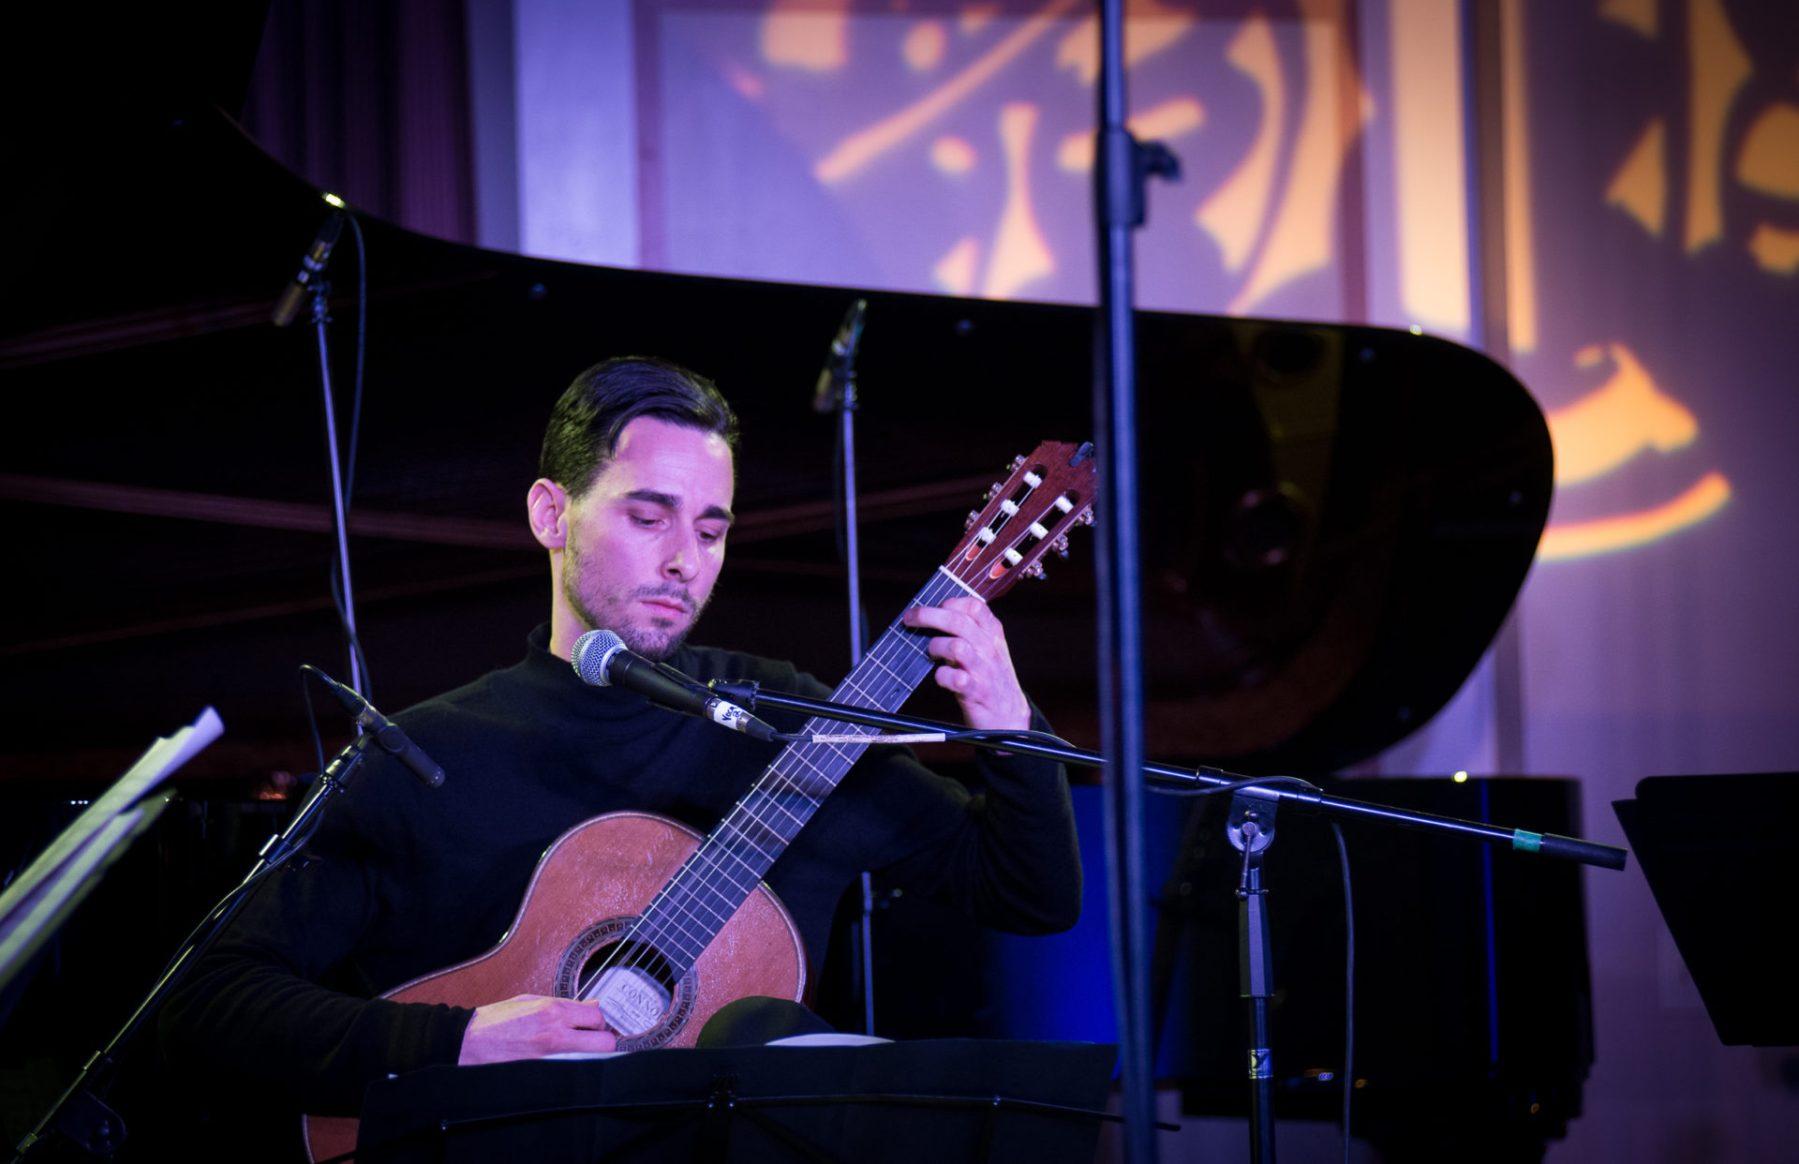 Adrian Verdejo, Music for the Winter Solstice 2016